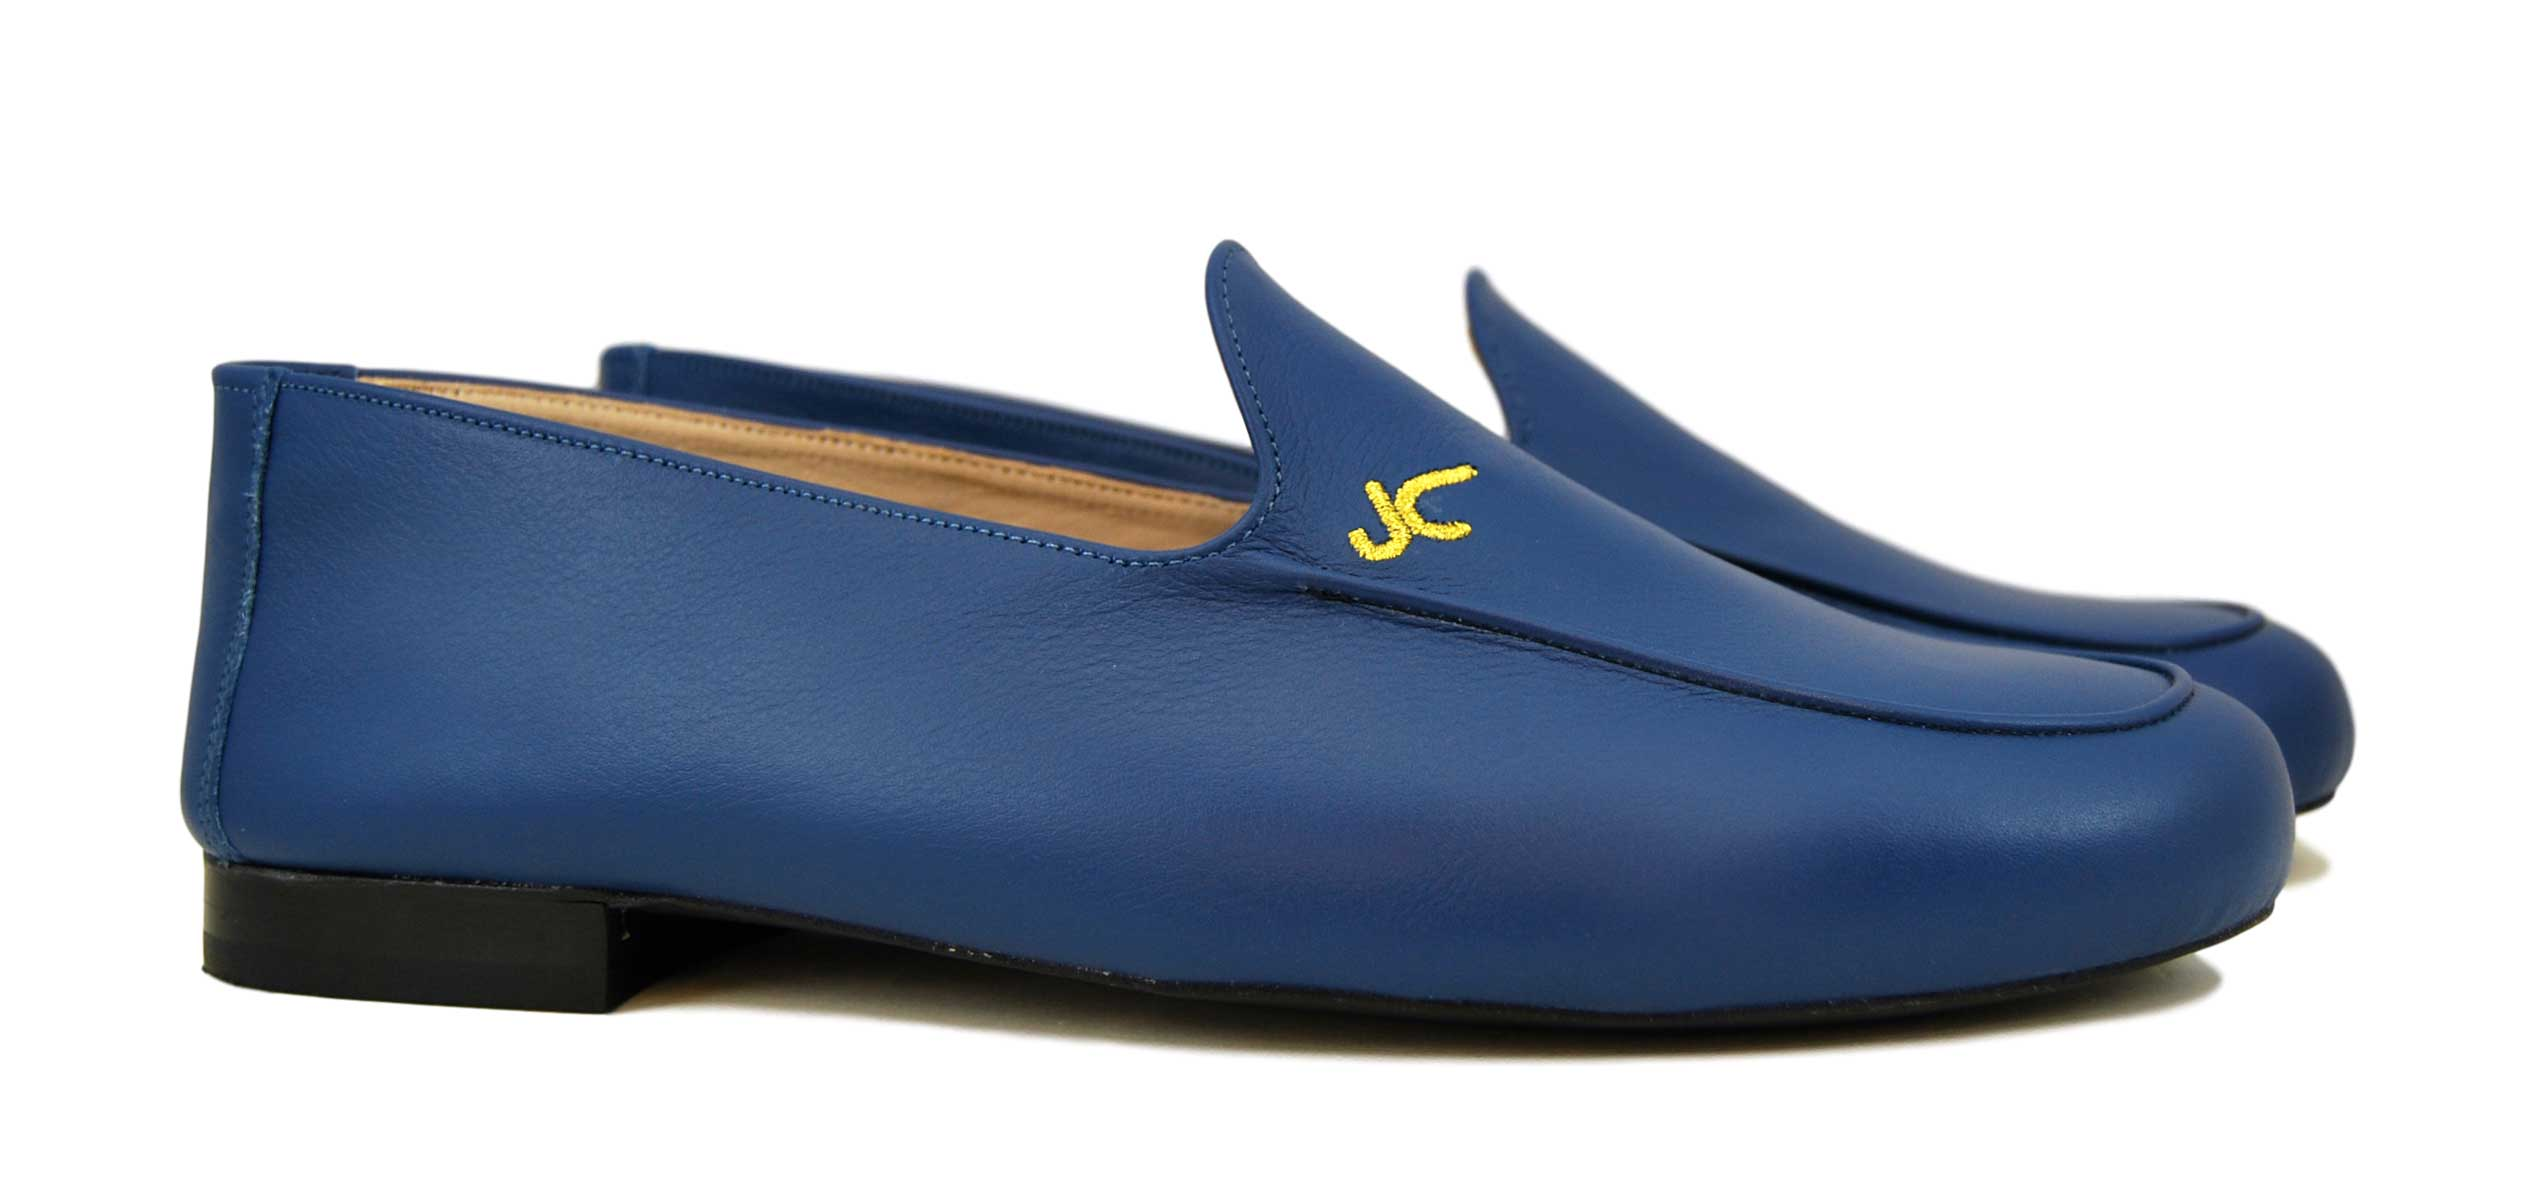 Foto 5 de Zapatos Julio Iglesias 528 JC Azulon Napa